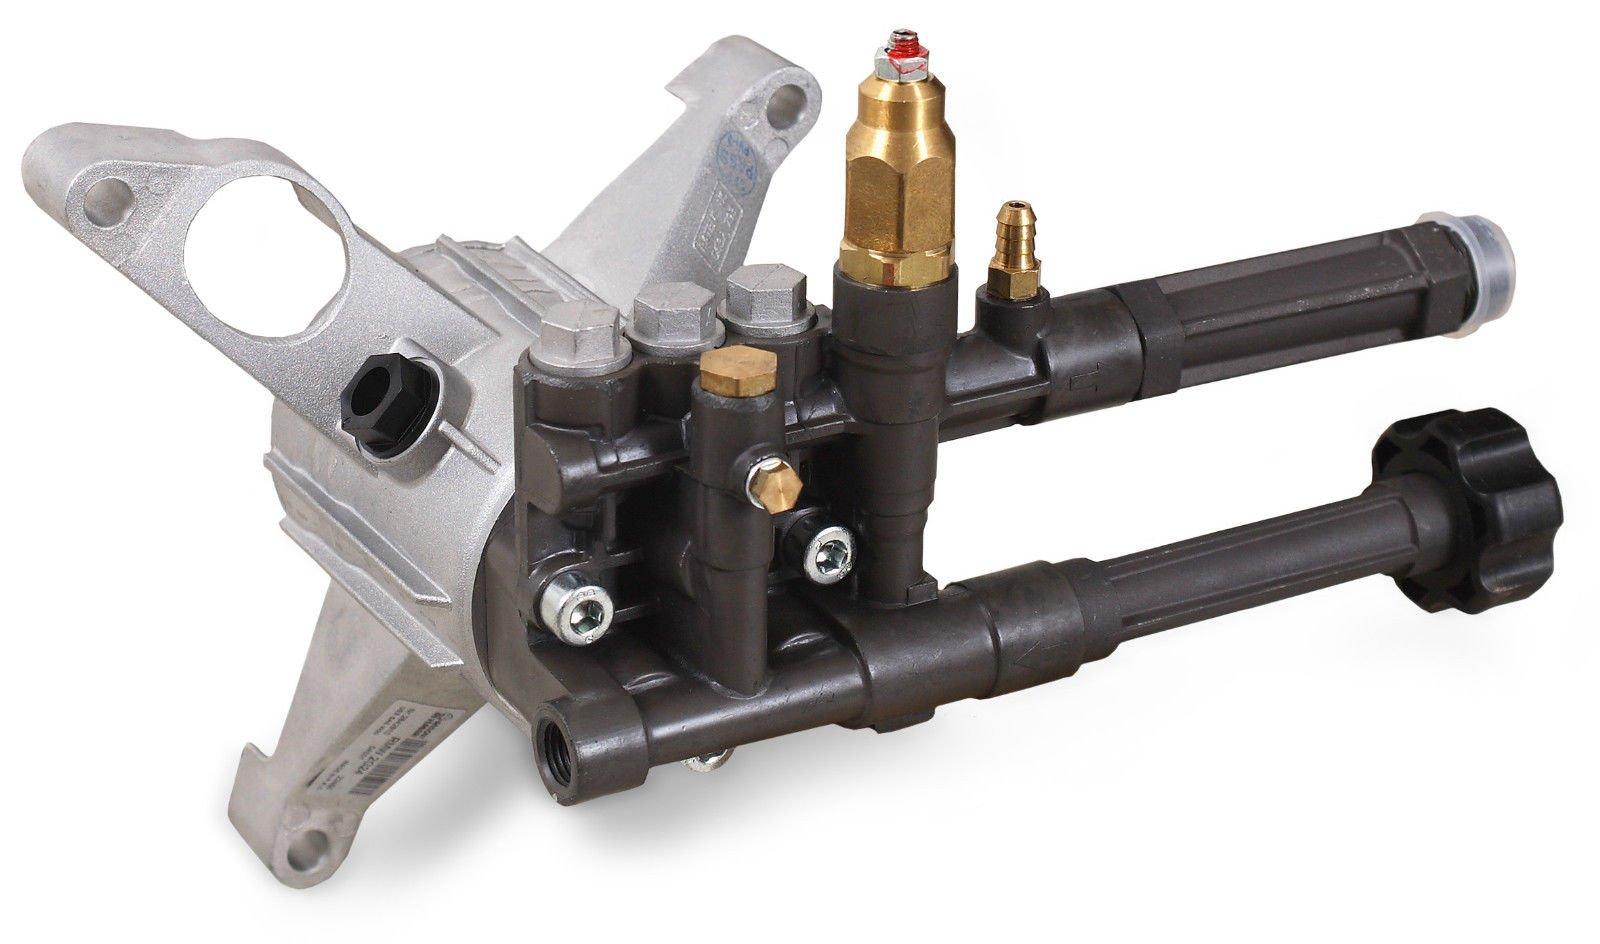 Pressure Washer Annovi Reverberi SRMW2.2G26 Vertical Shaft Pump with Thermal by Pressure Washer